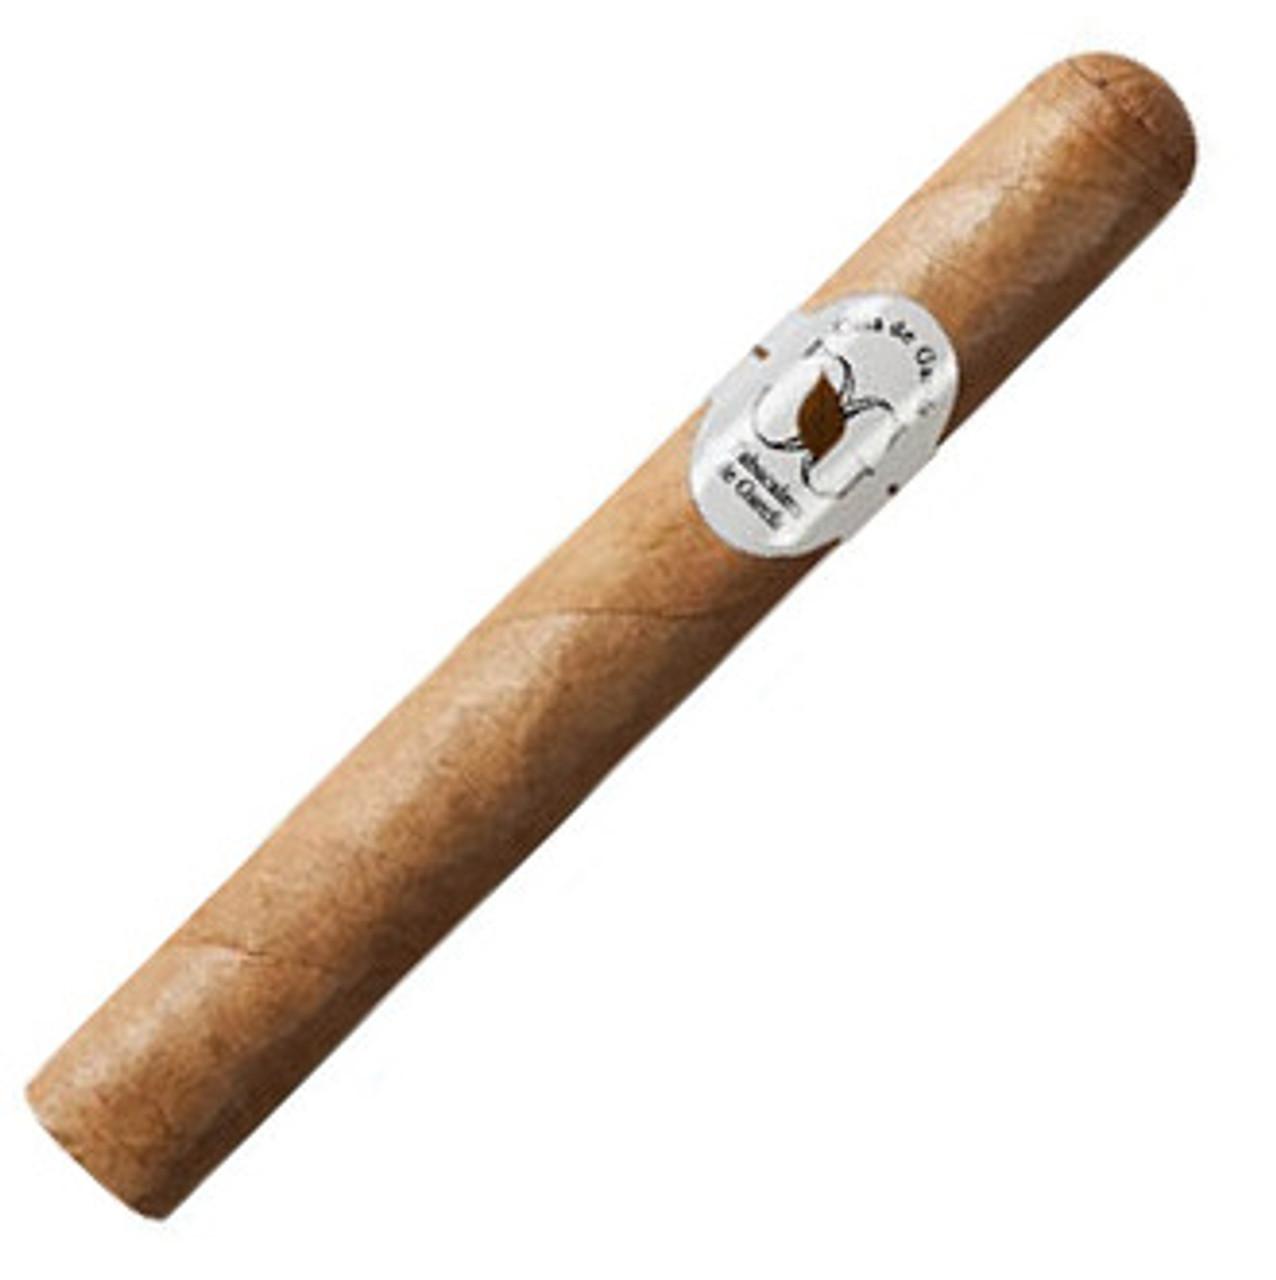 Casa de Garcia Connecticut Toro Cigars - 5.5 x 50 (Bundle of 20)